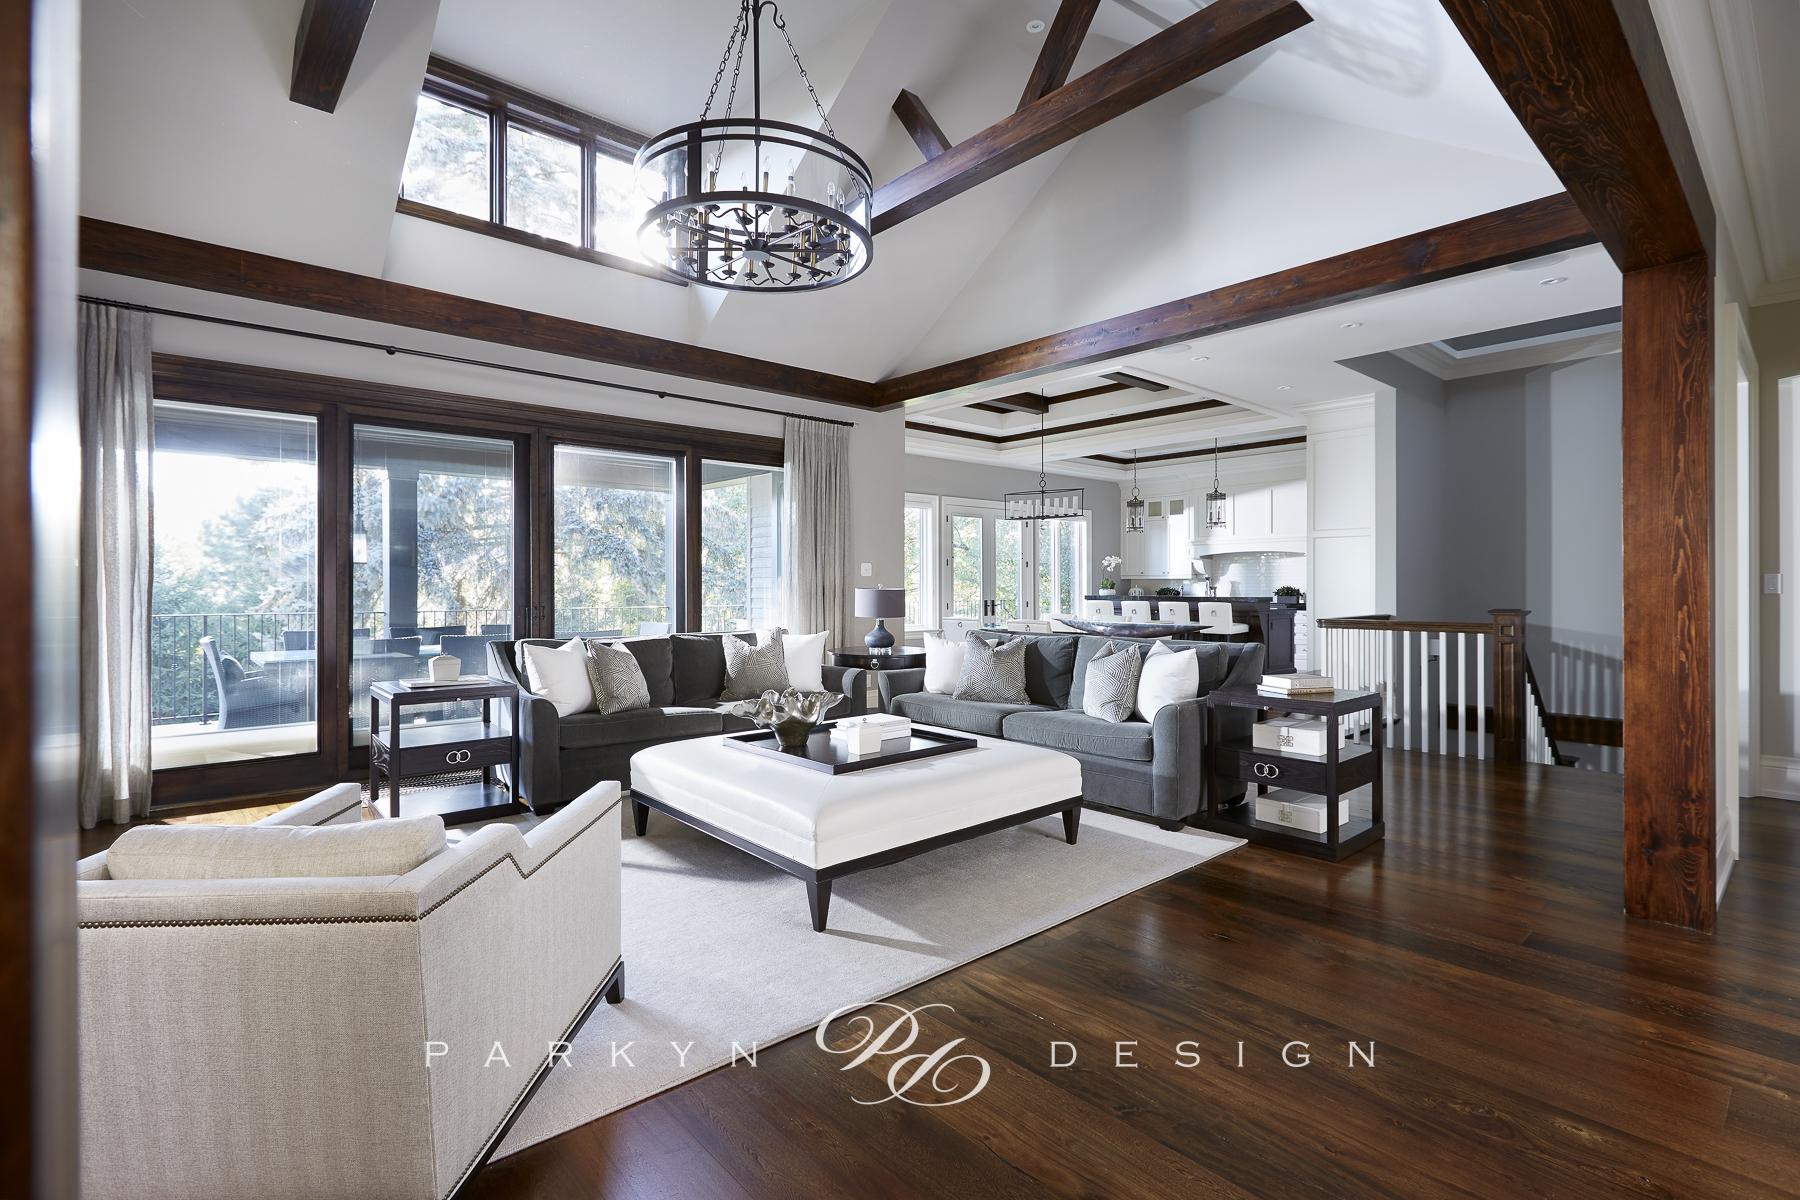 Transitional Bungalow Parkyn Design Interior Design